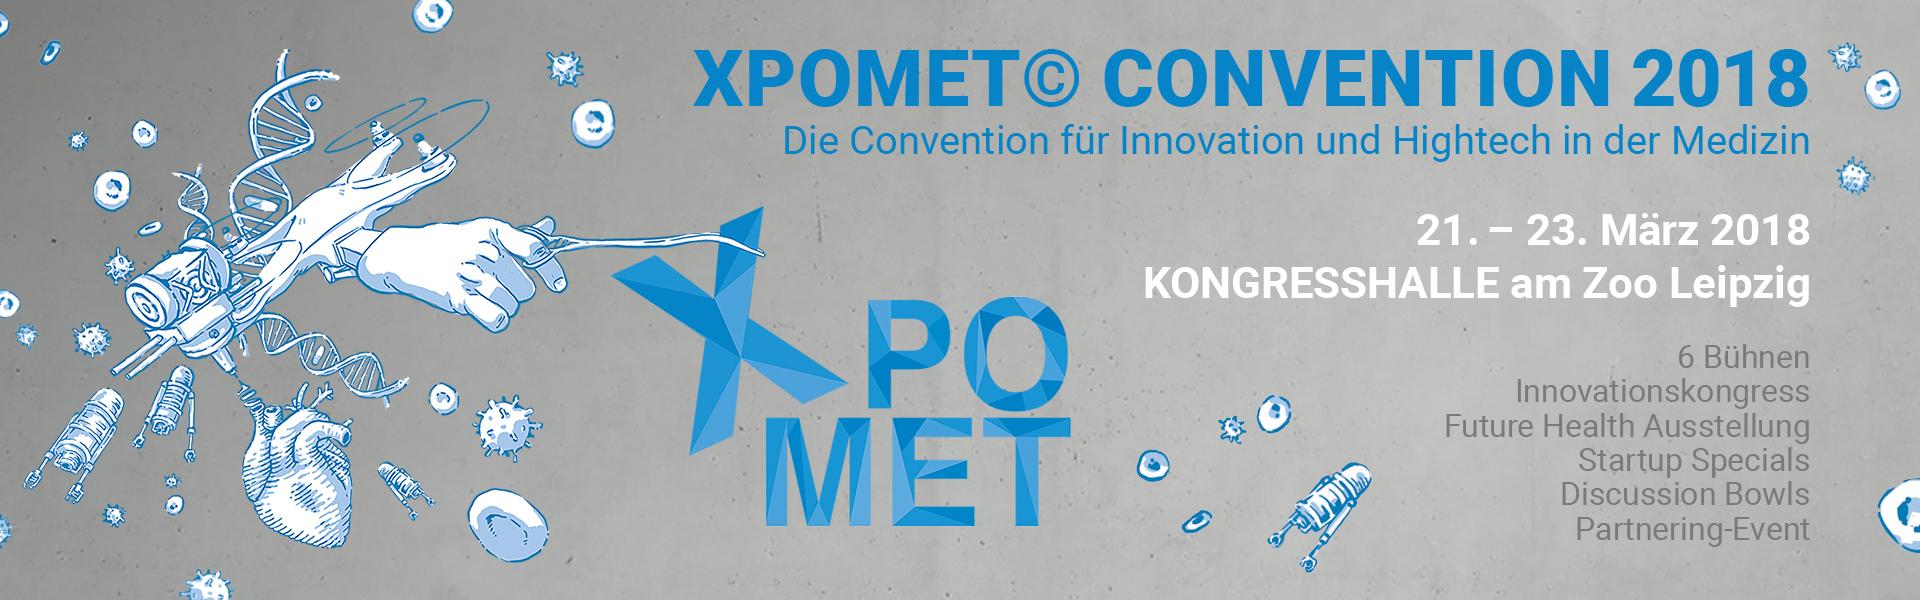 Xpomet Leipzig mit conpega